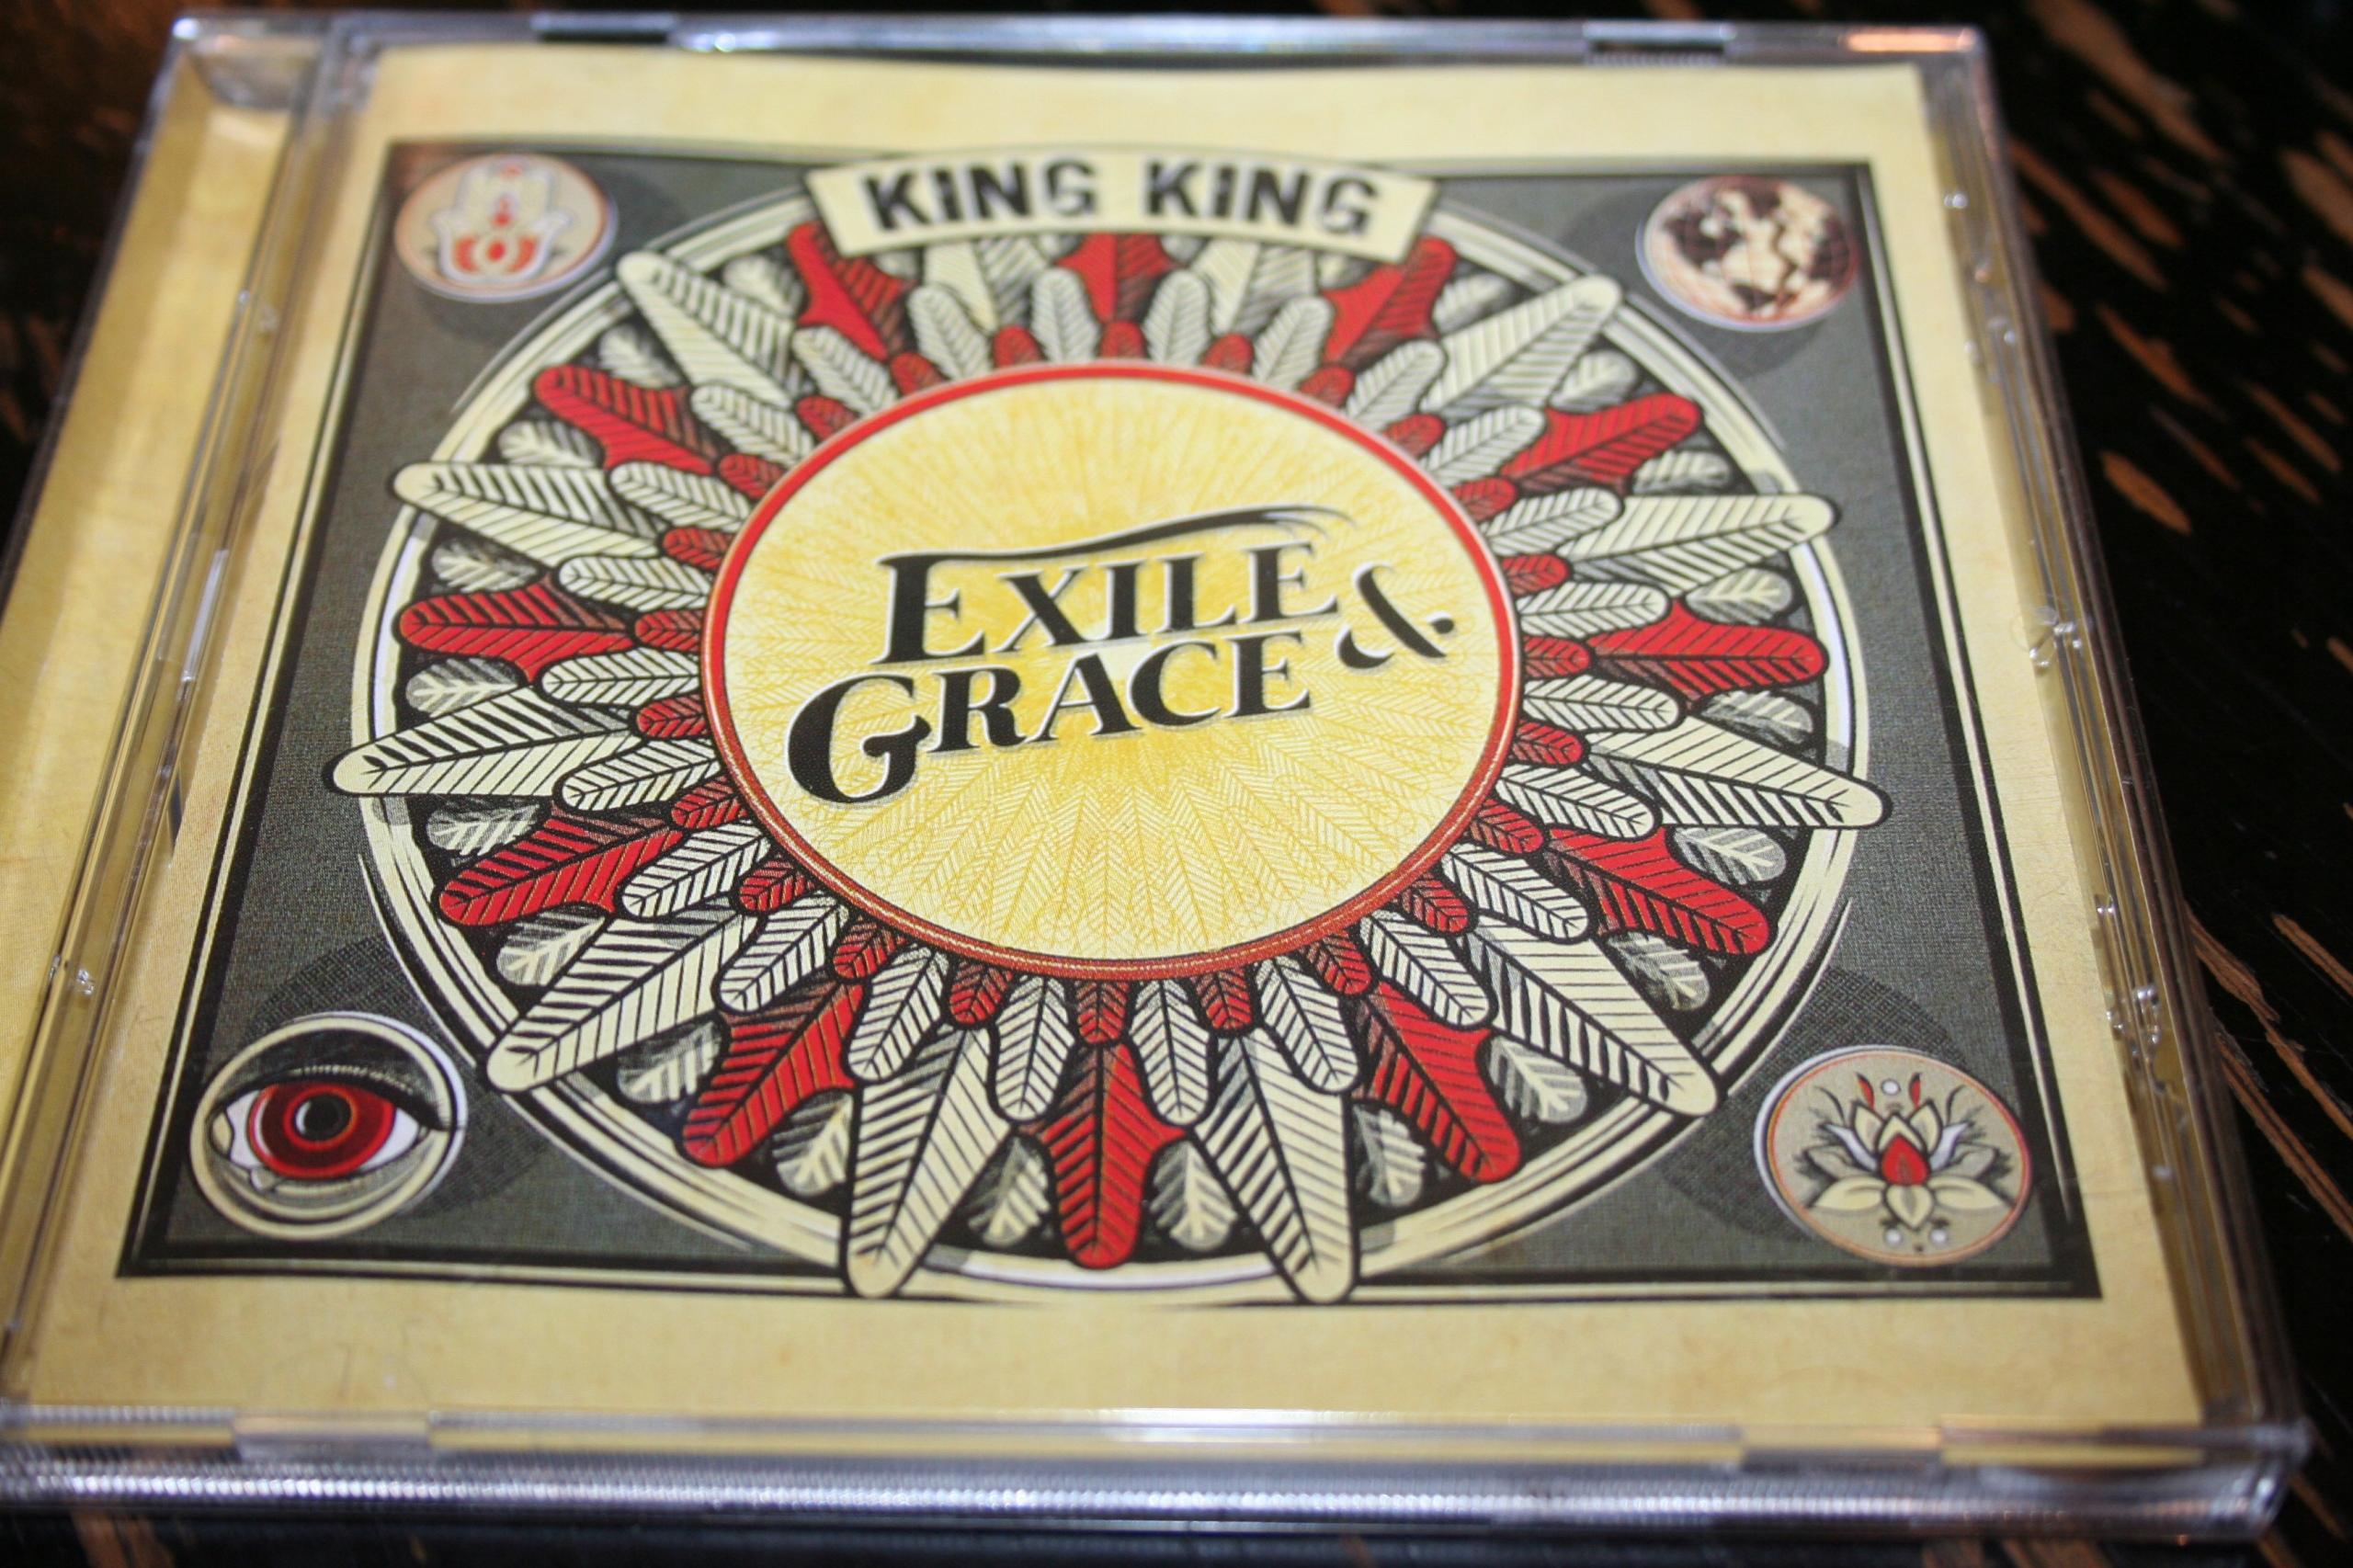 KING KING Exile & grace !!!